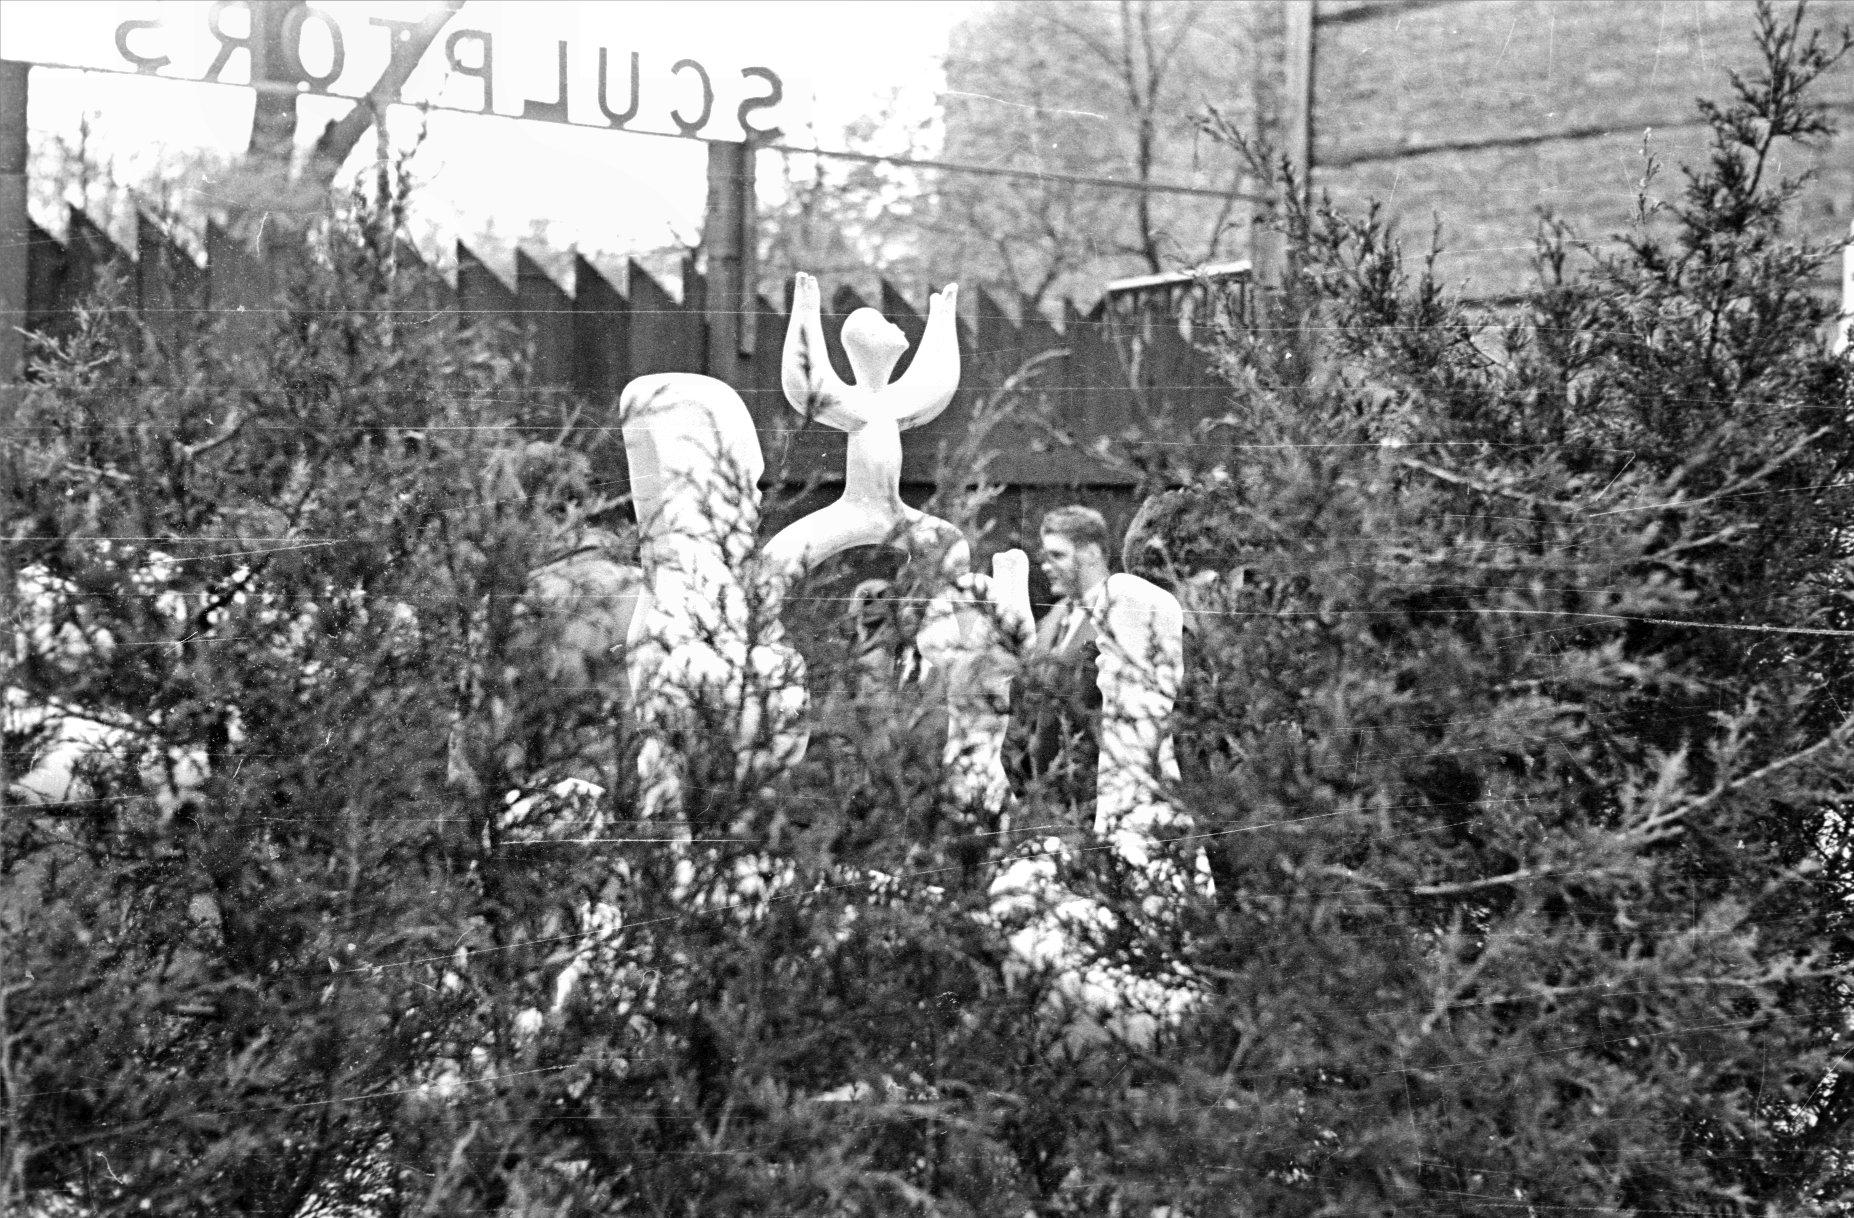 New York - Garden Exhibit 4